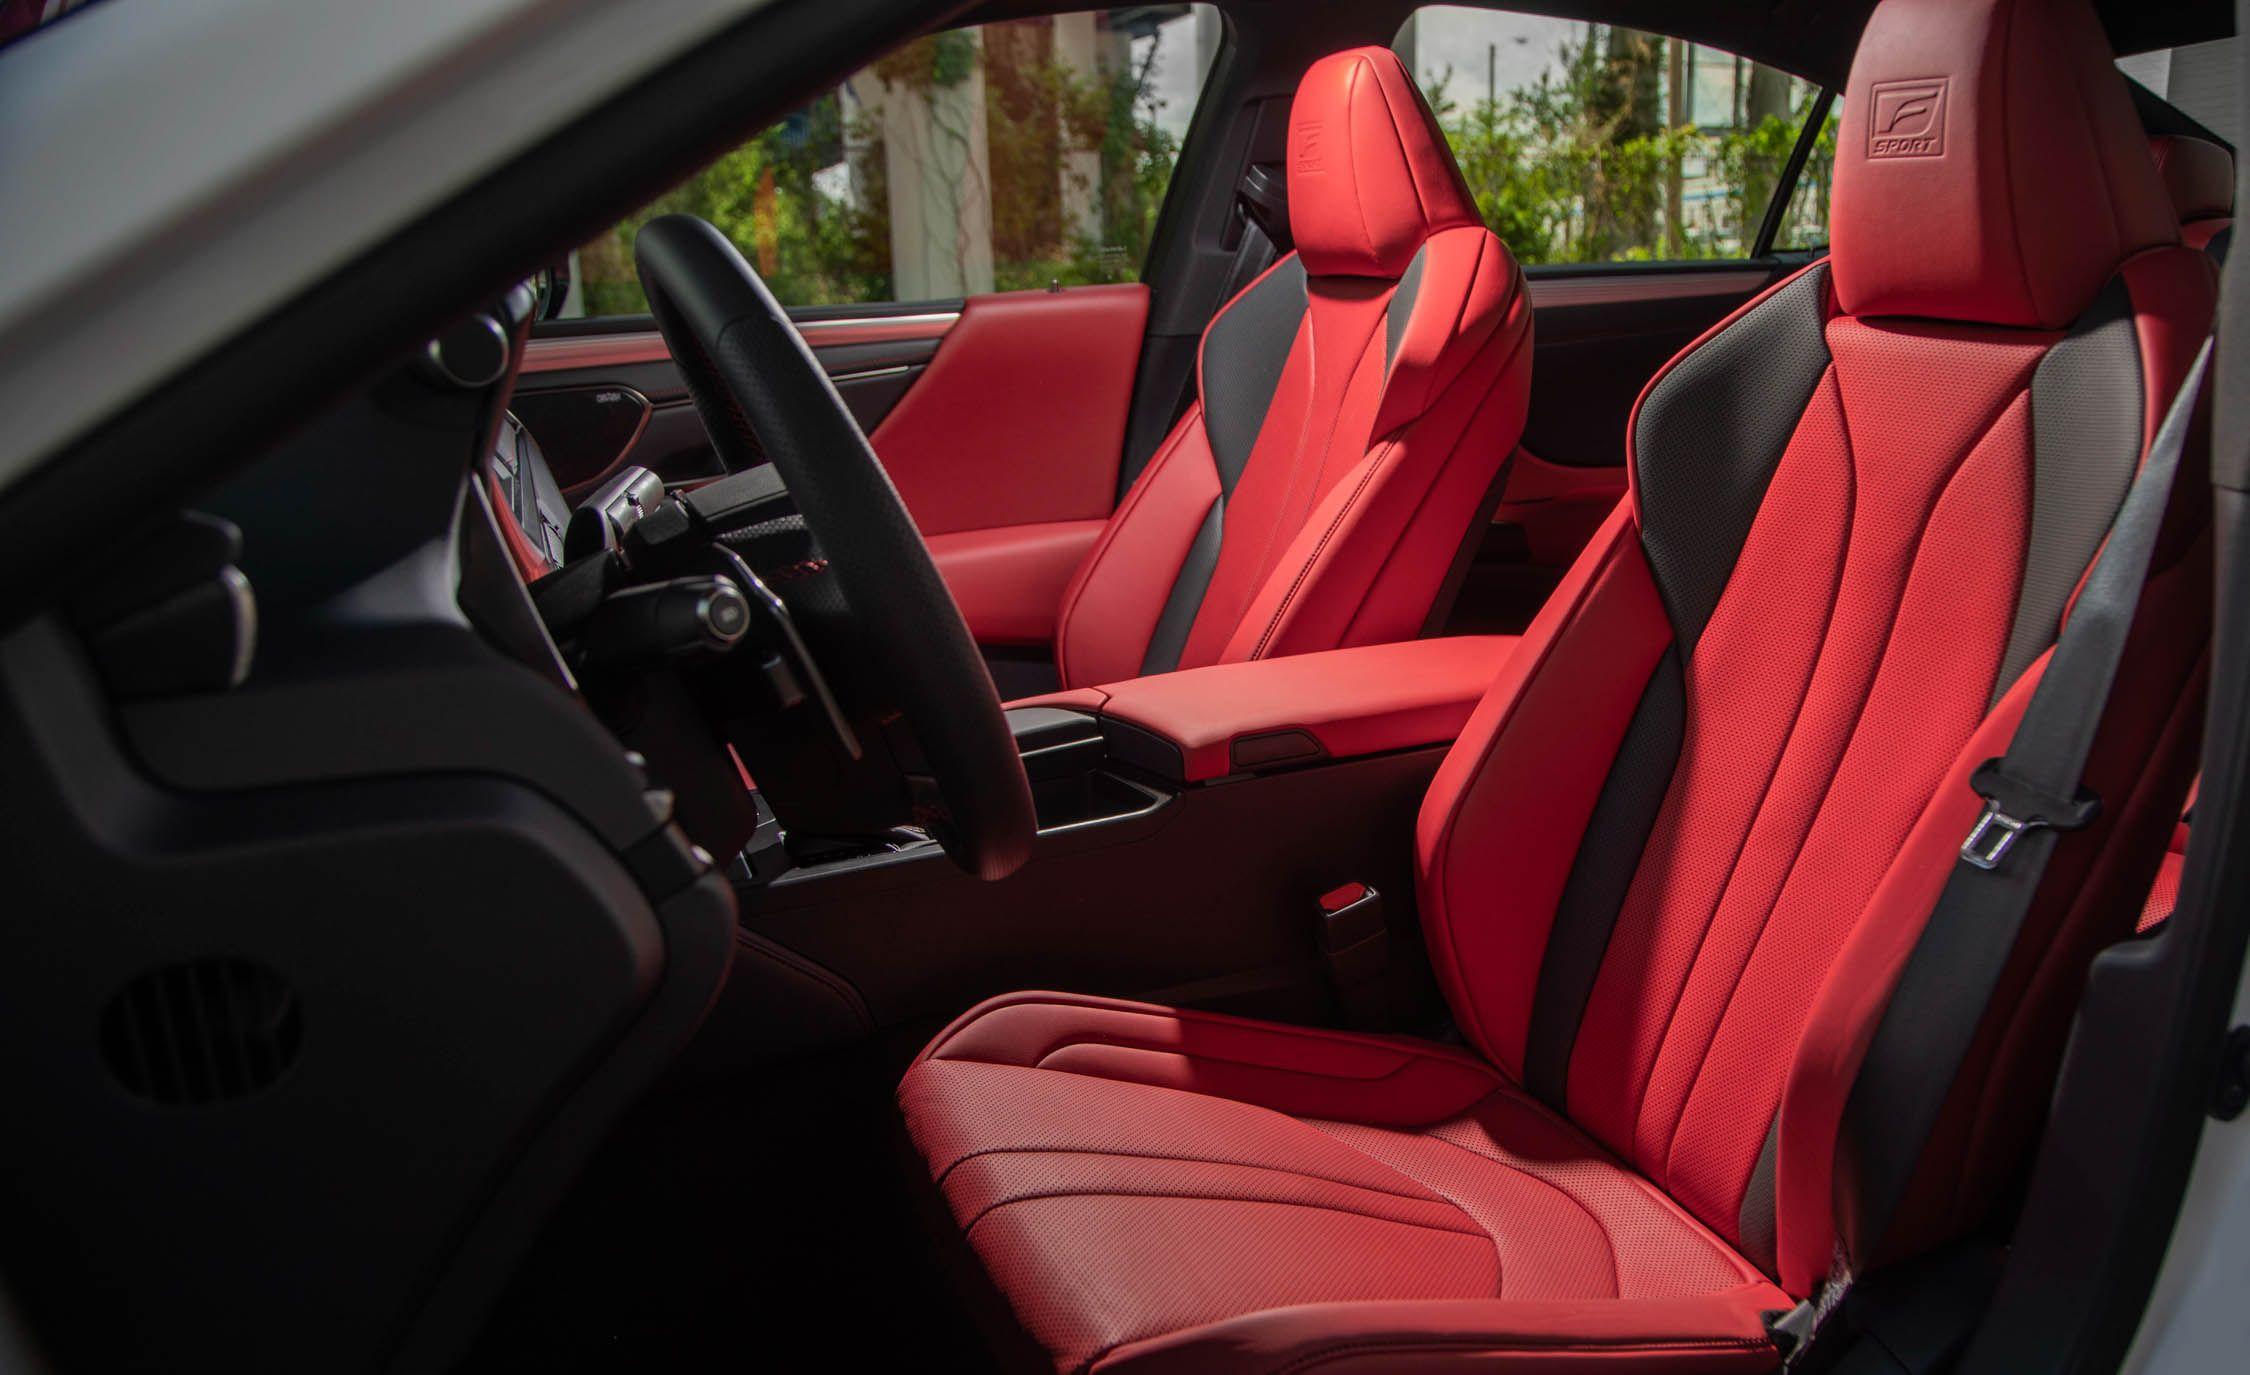 2019 Lexus Es First Drive Elegance Greets Athleticism Review